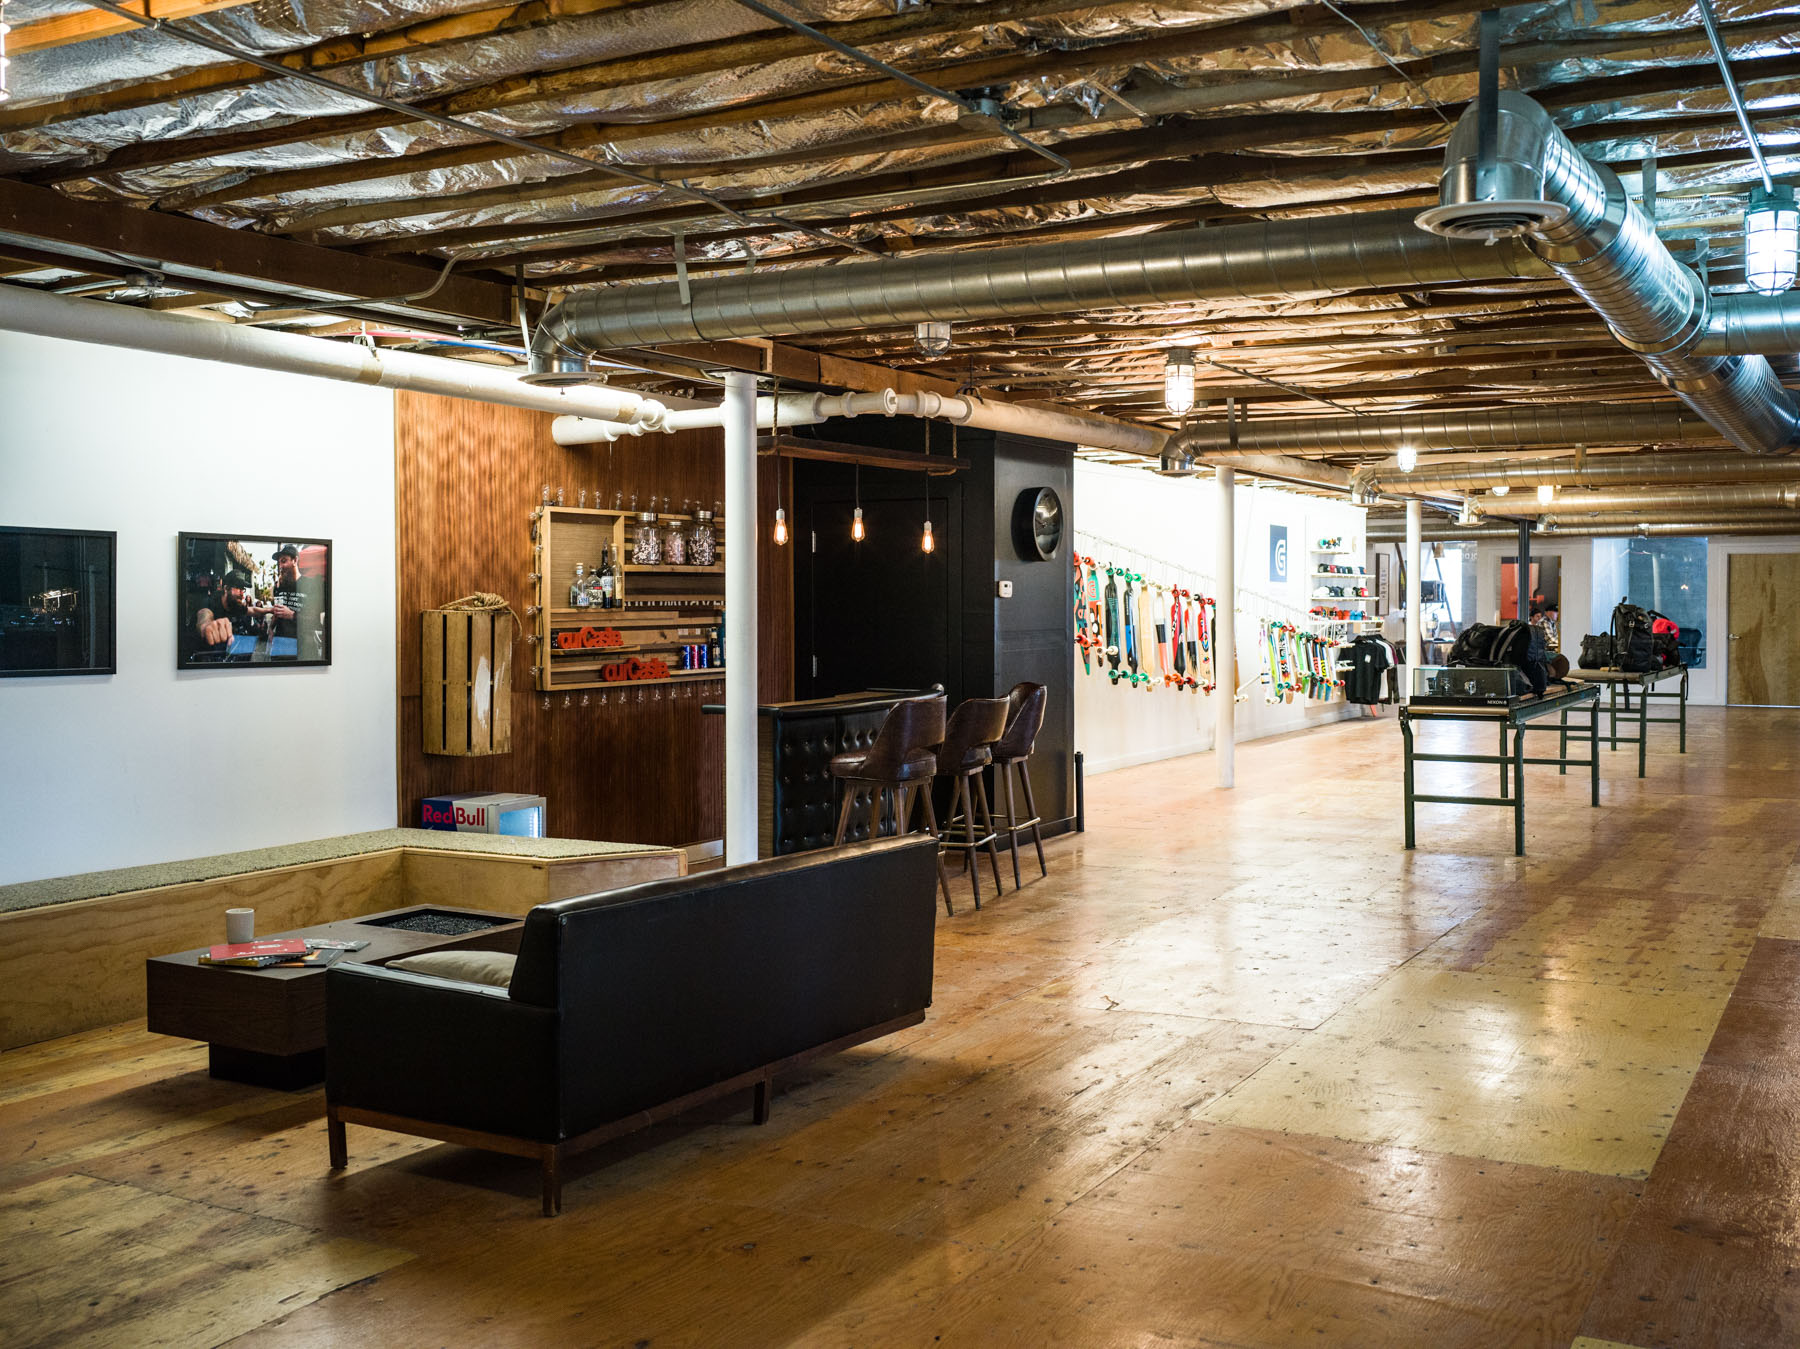 Windermere-Commercial-Real-Estate-Utah-Hip-Industrial-Creative-Office-Space3